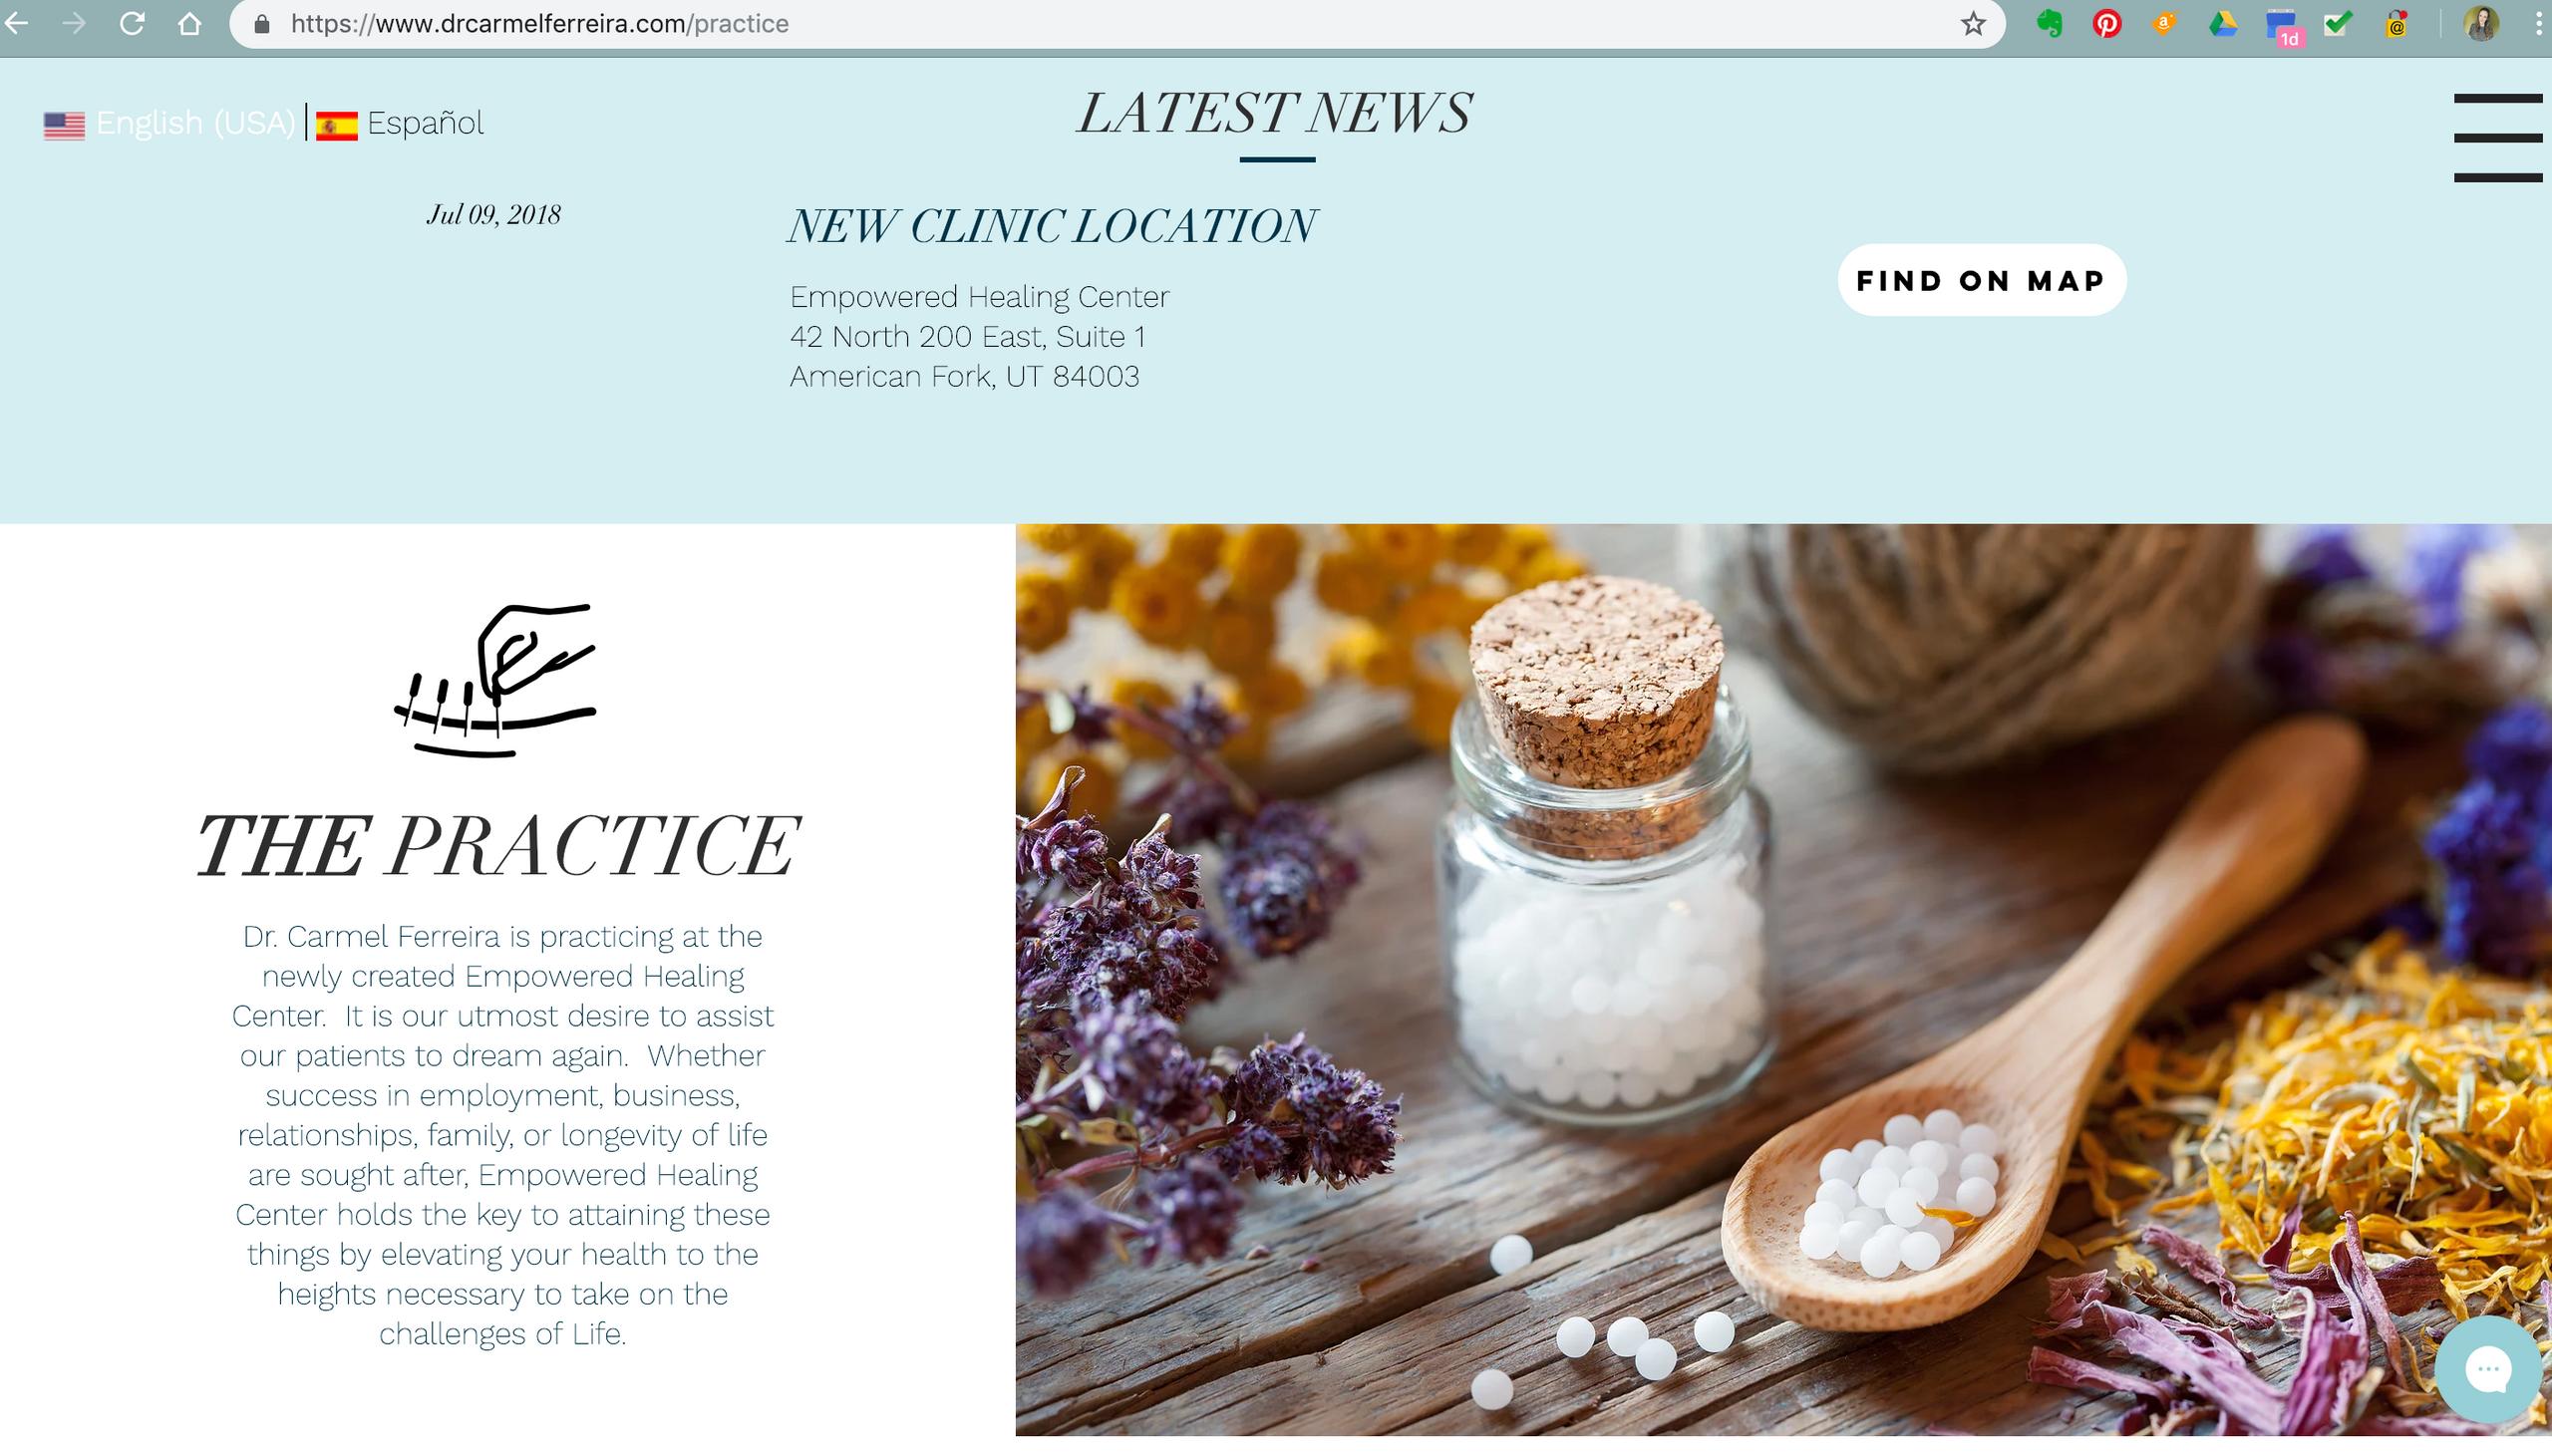 Empowered Healing Center Website Design